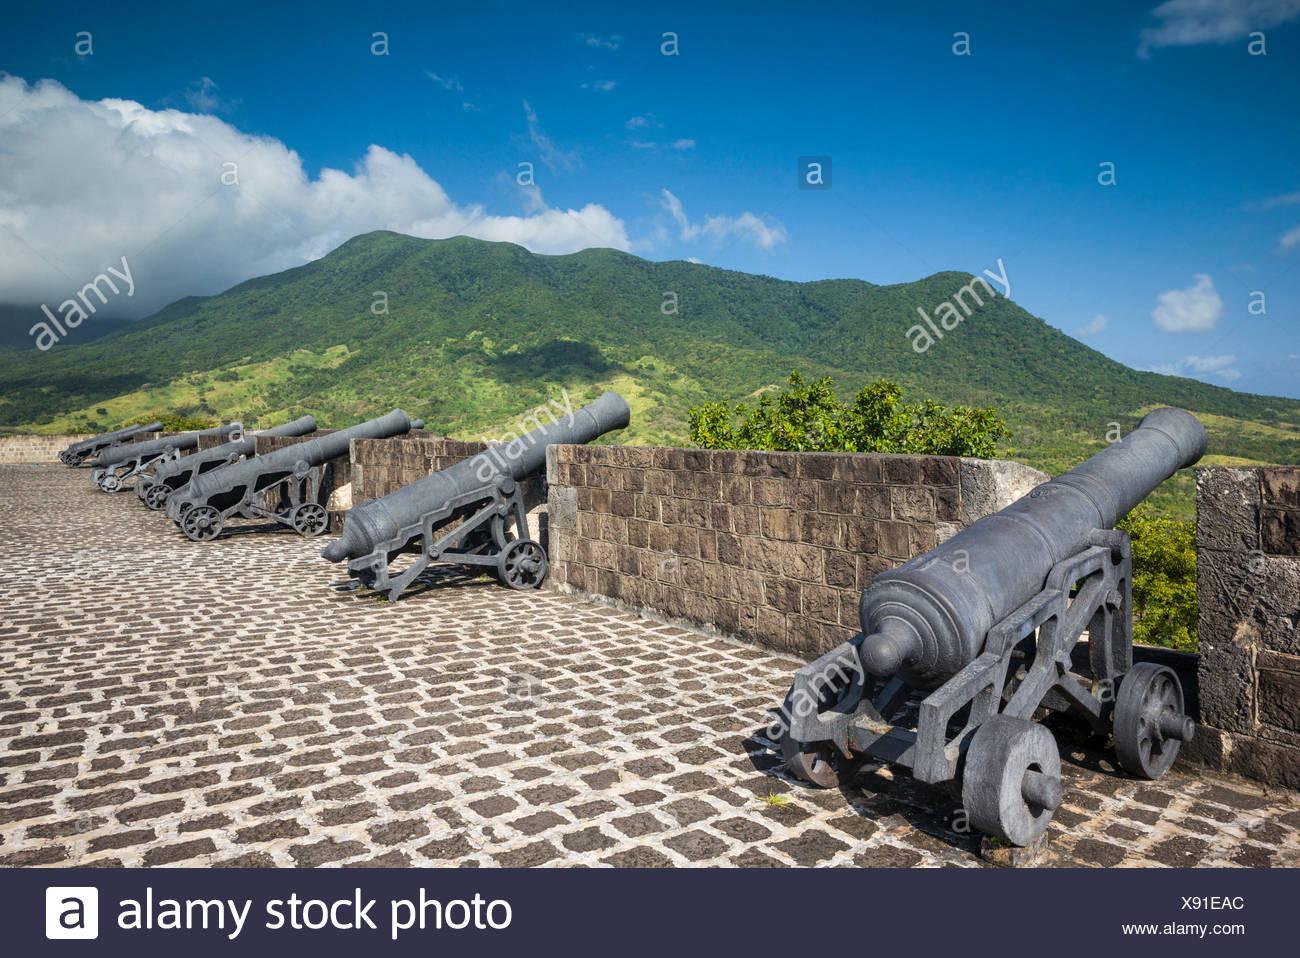 St. Kitts e Nevis, St. kitts, Brimstone Hill, Brimstone Hill Fortress Foto Stock